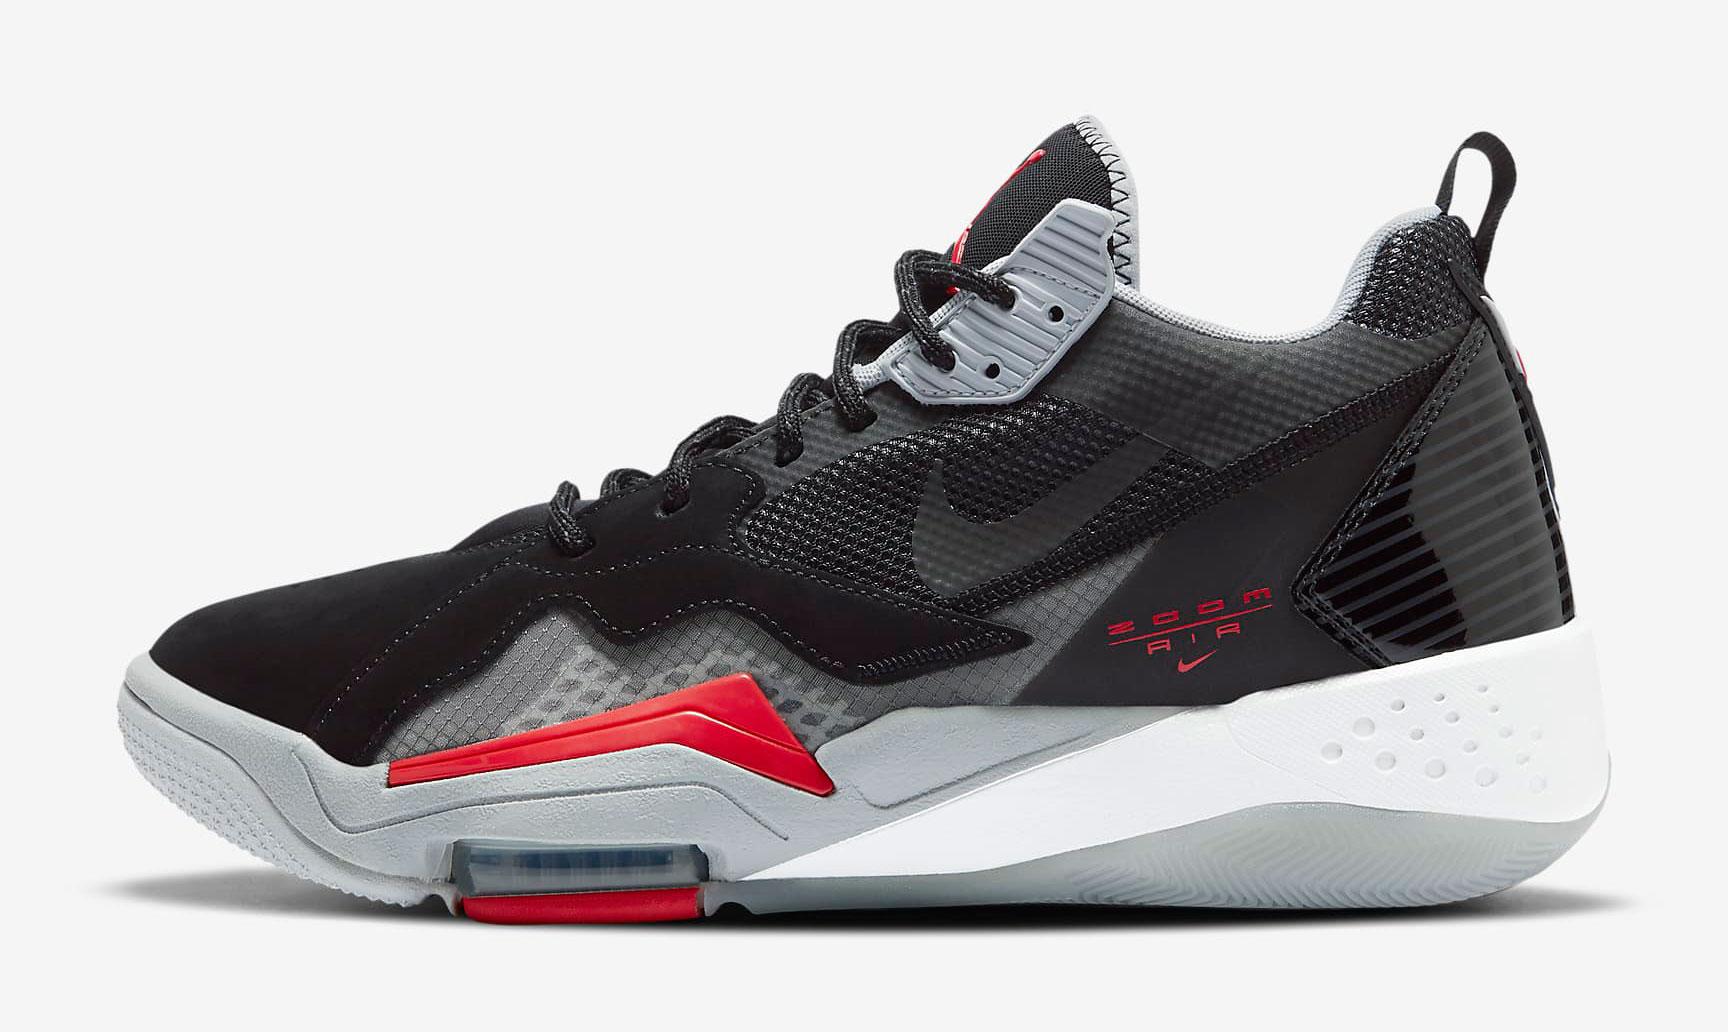 jordan-zoom-92-black-red-bred-cement-2